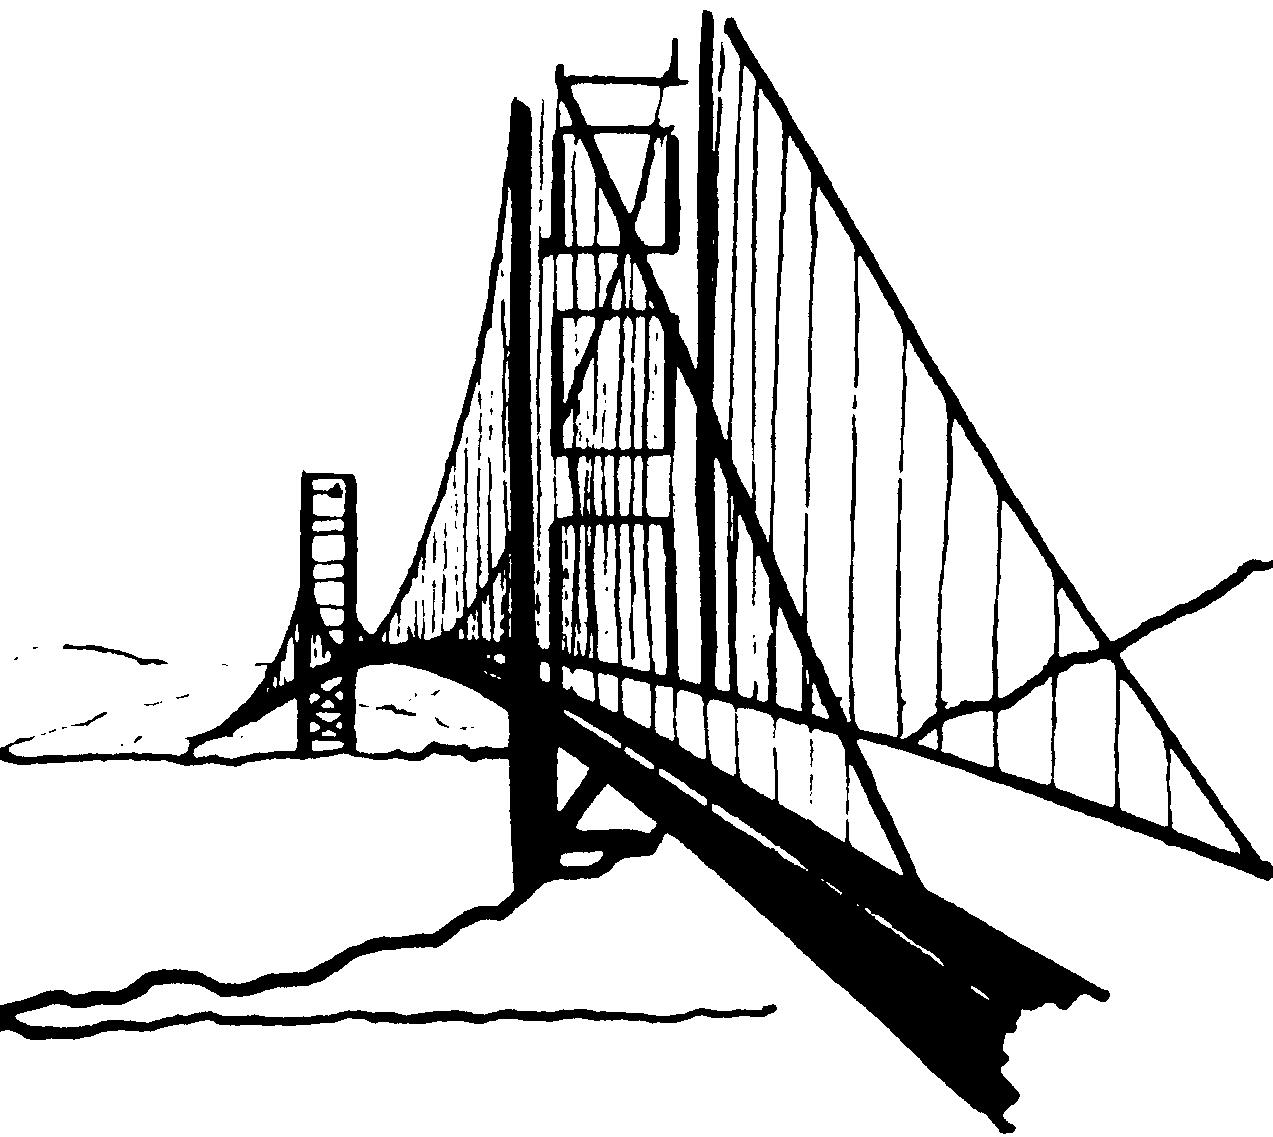 1273x1137 Bridge Clip Art Black And White Free Clipart Images Image